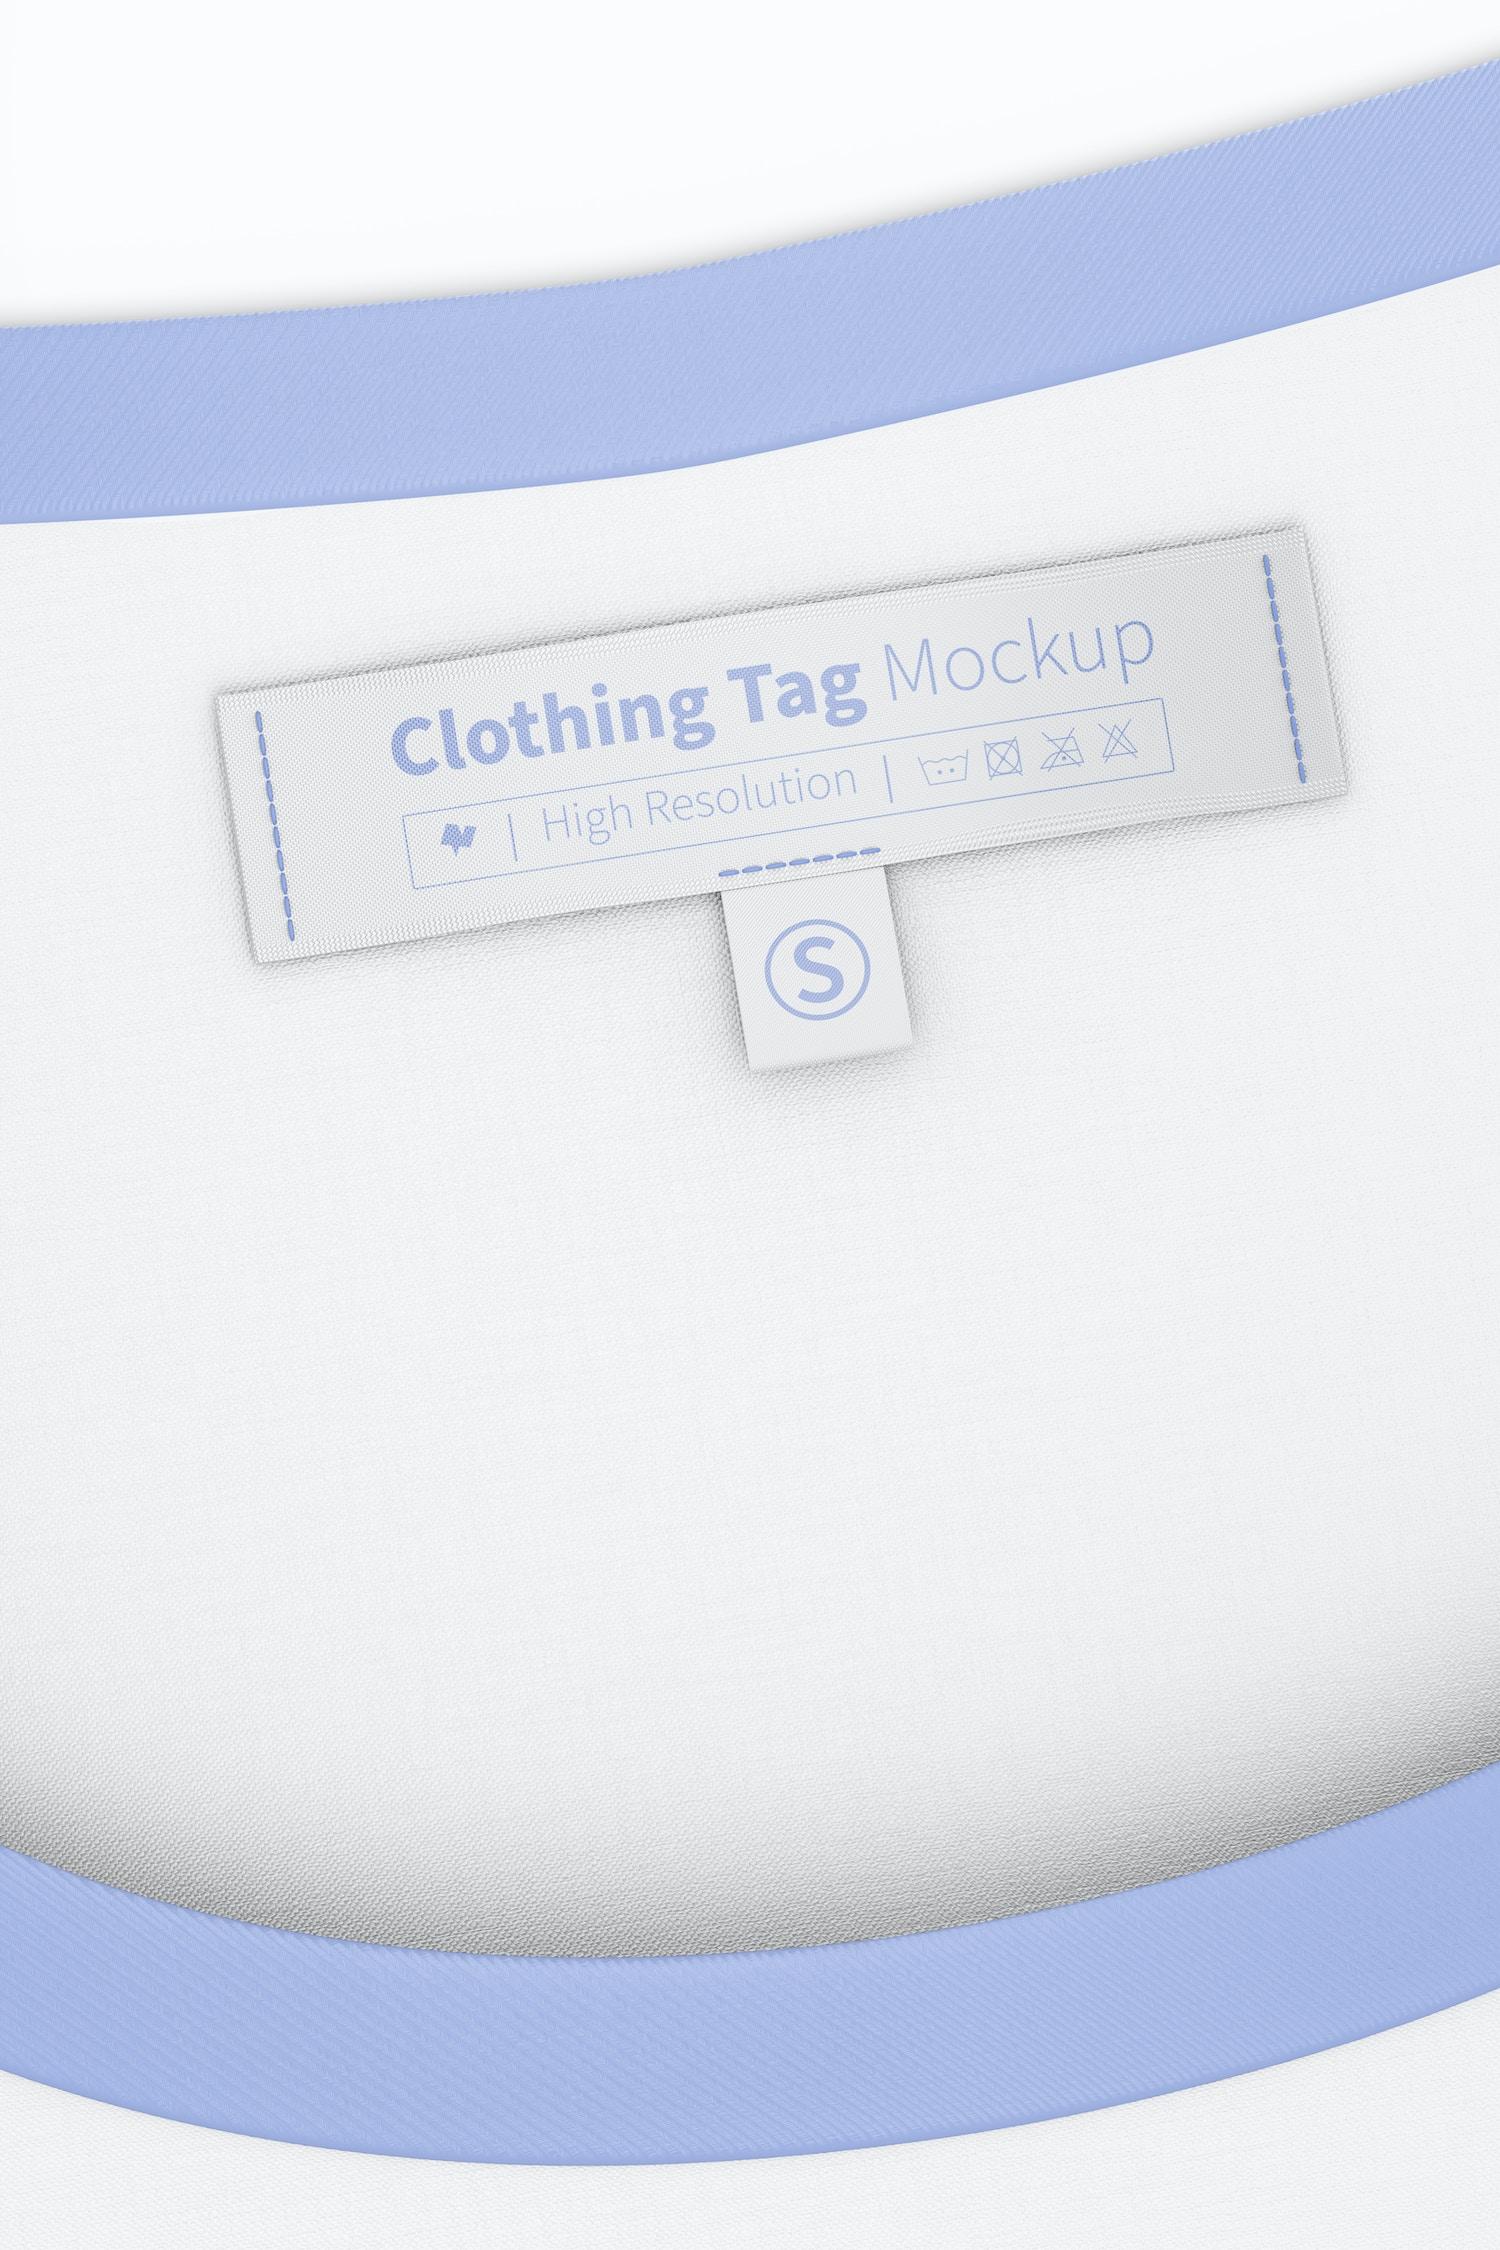 Clothing Tag Mockup, on T Shirt